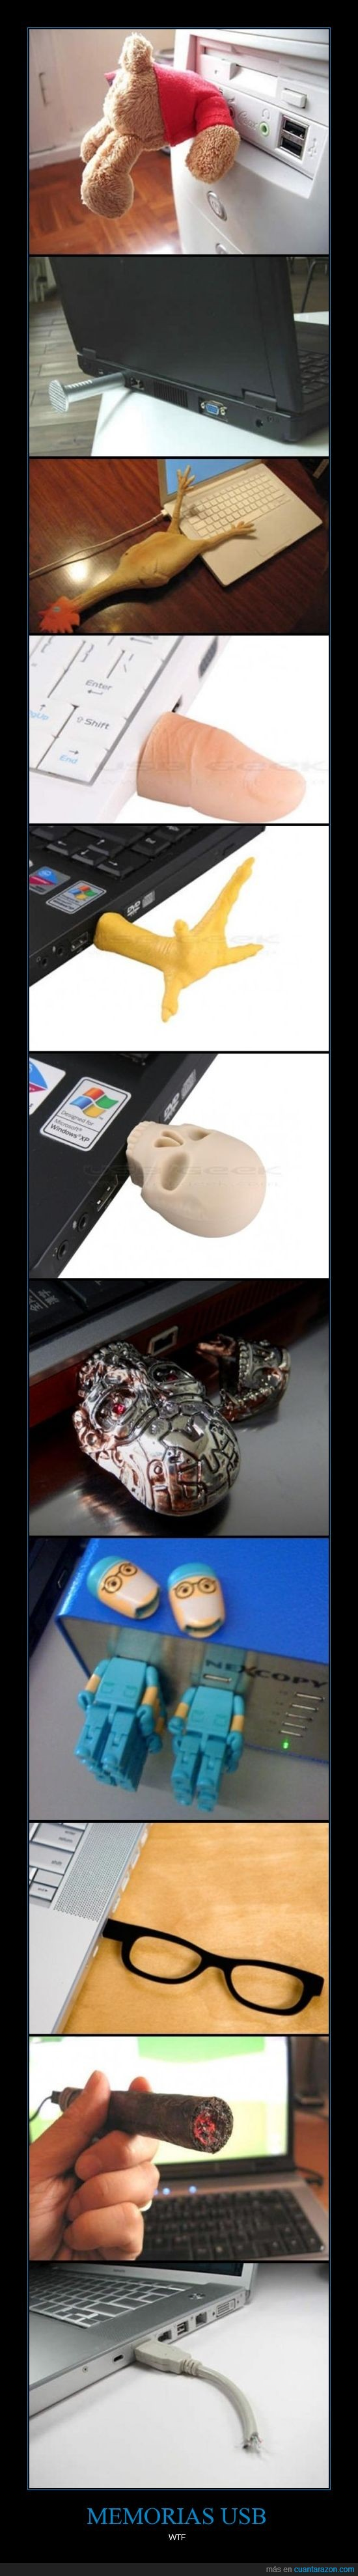 curiosas,Memorias USB,PenDrive